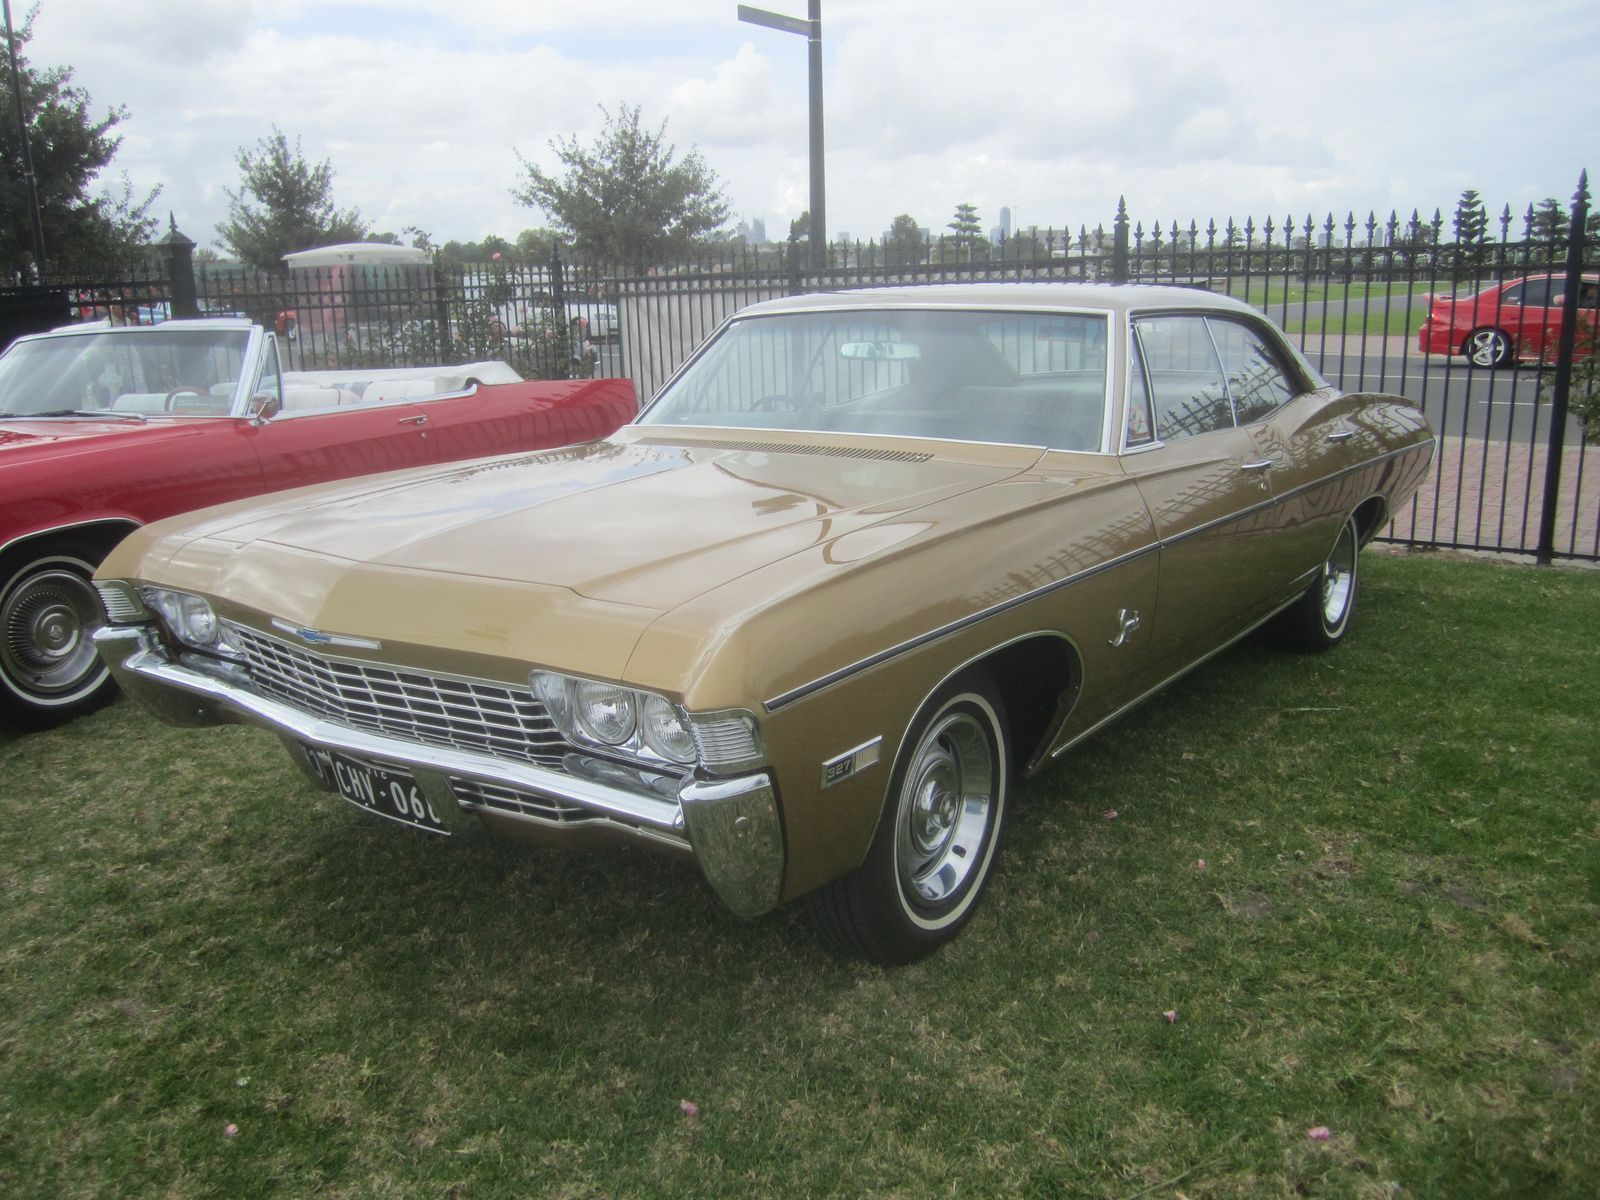 1968 Chevrolet Impala 4 Door Hardtop Chevrolet Impala